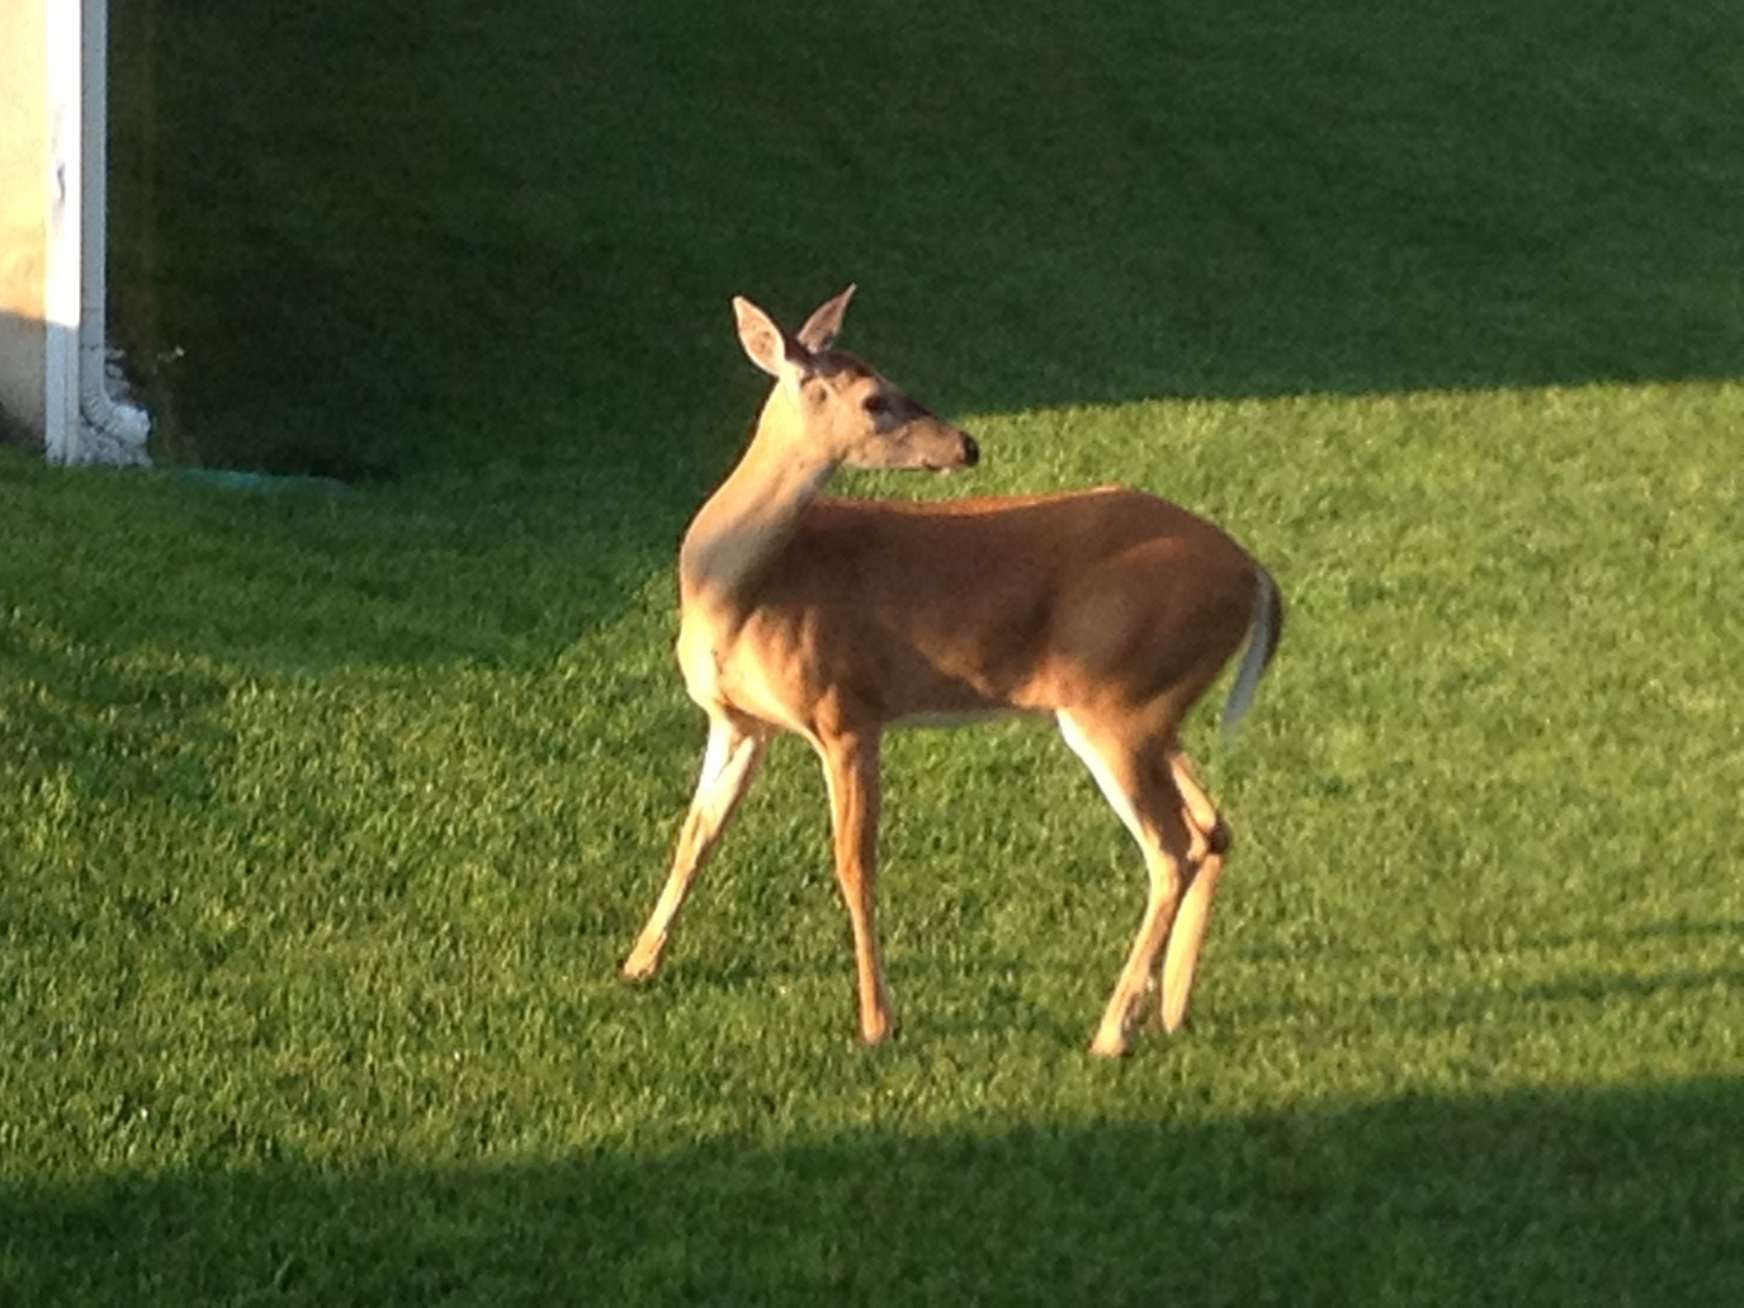 Multi-deer-mentional and Bambi-dextrous (not tonight deer)